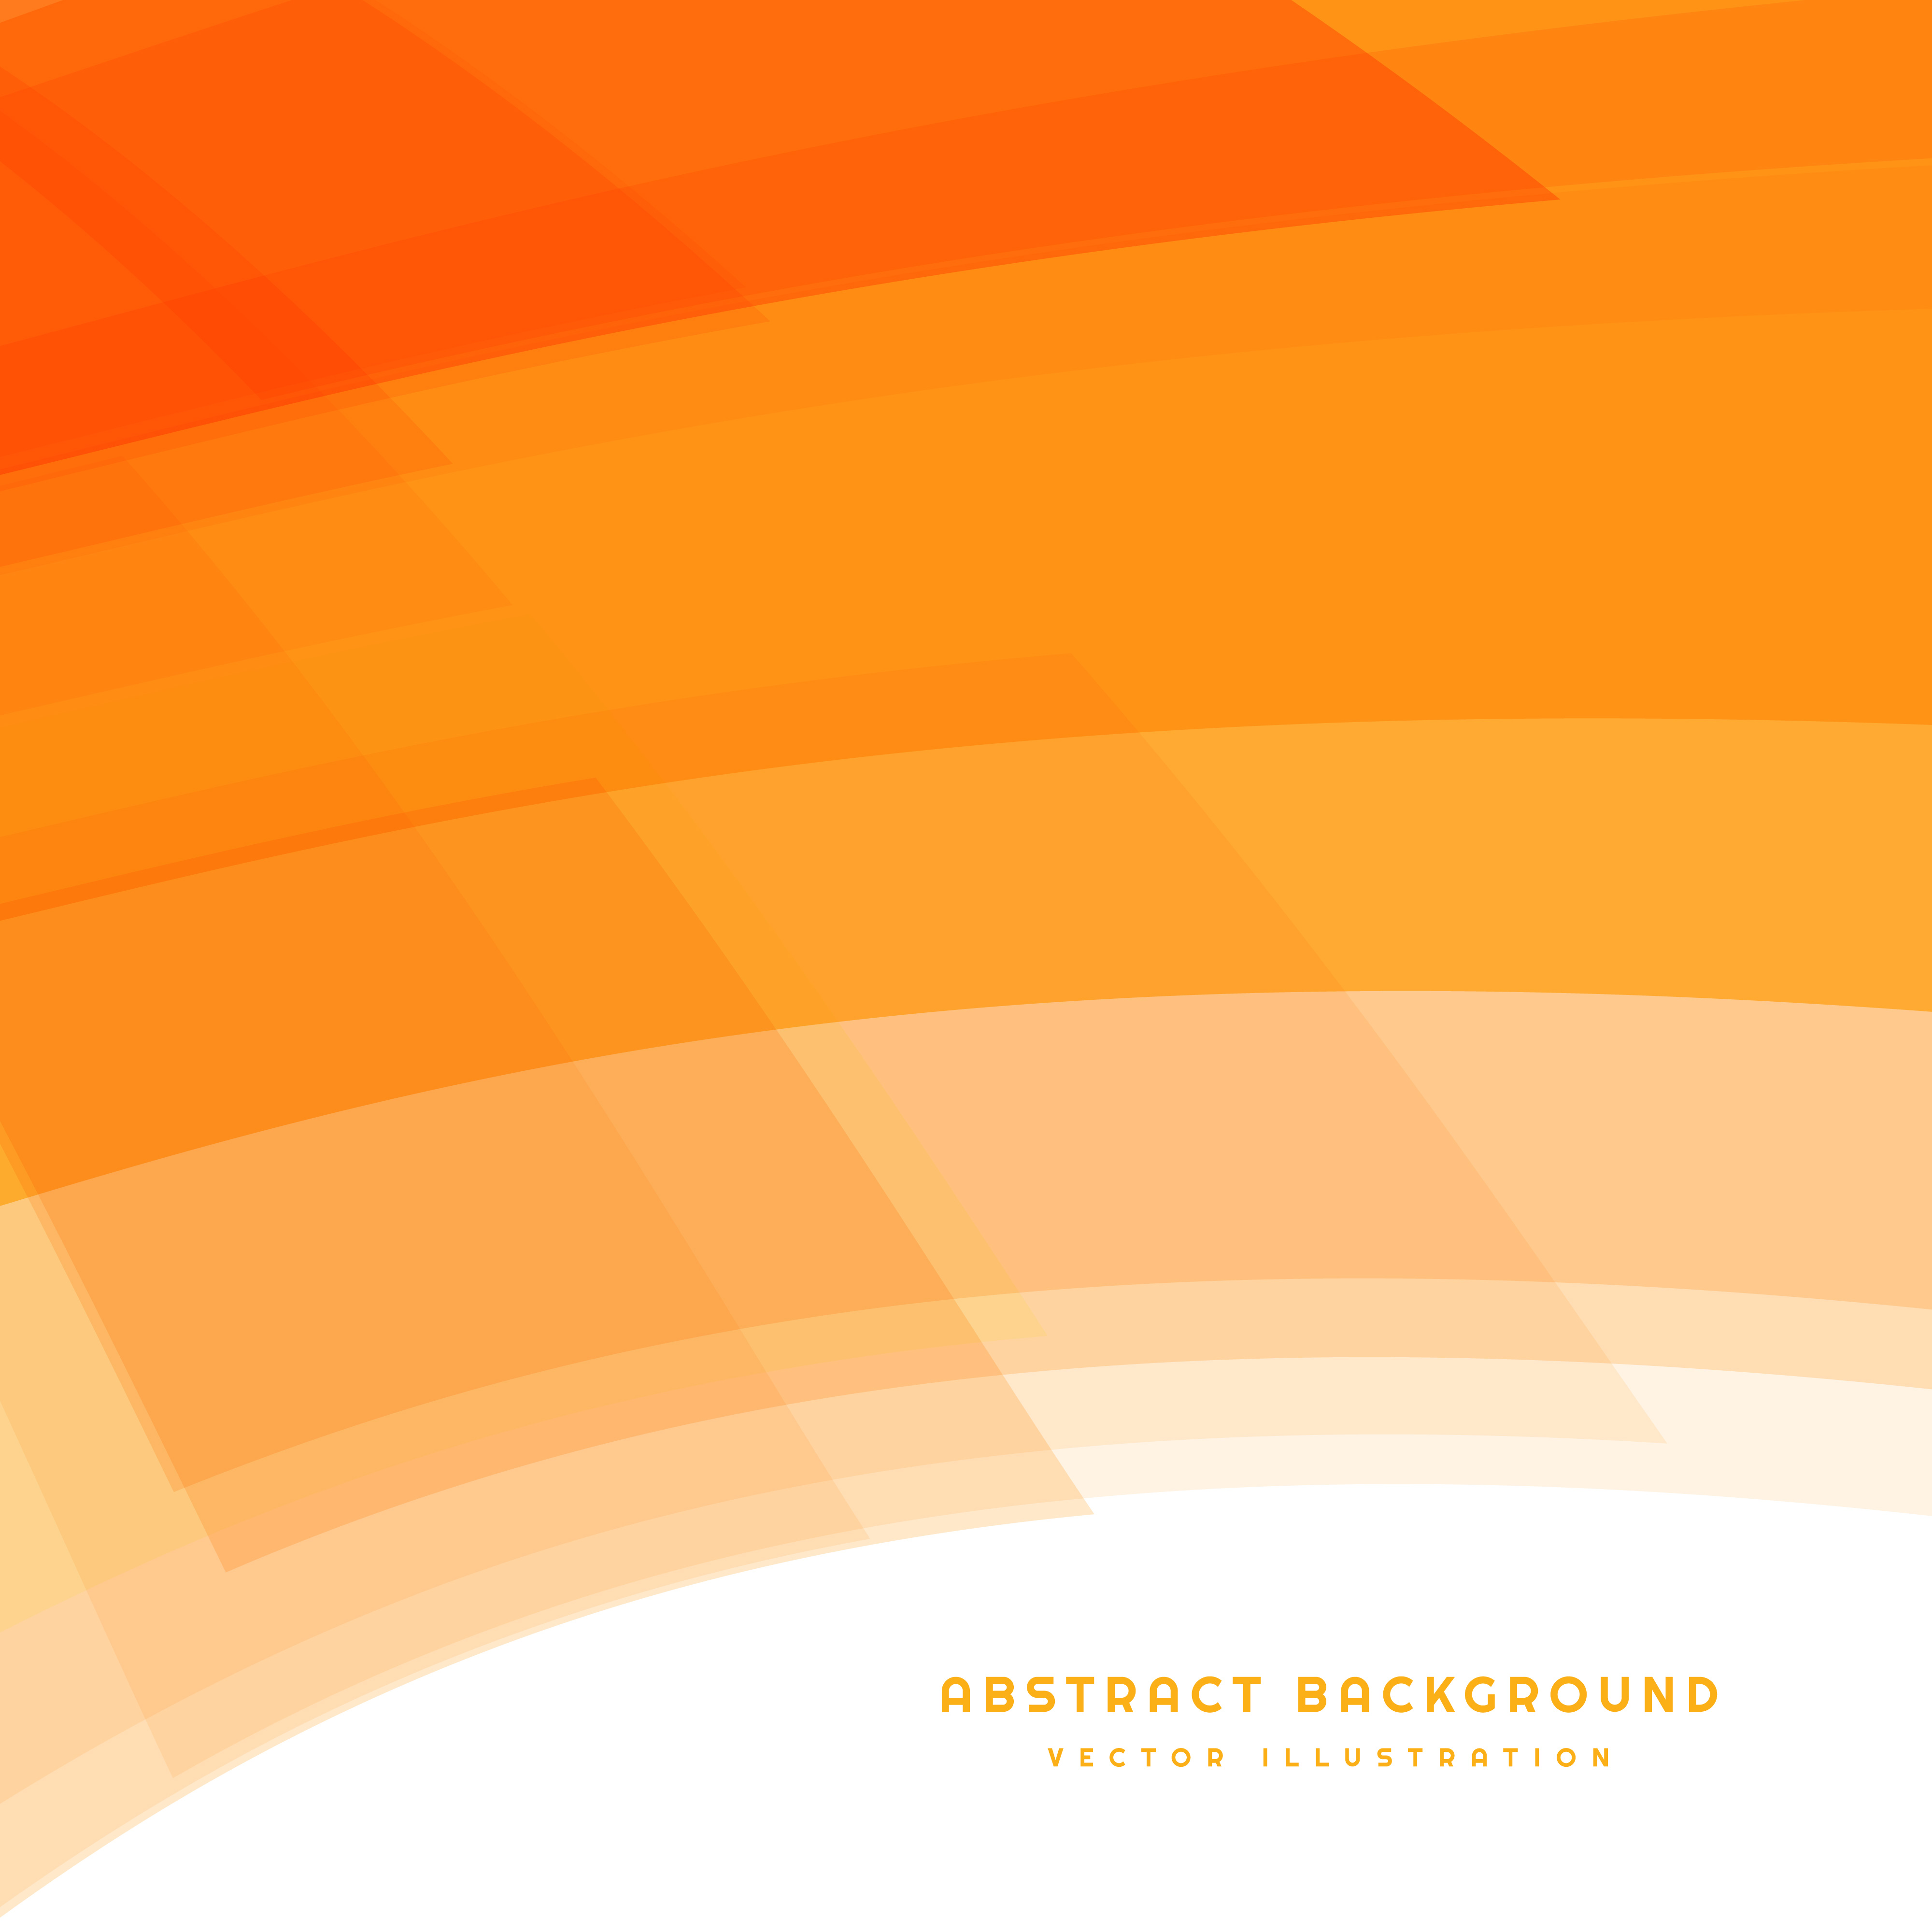 Orange Vector Background orange background - Do...